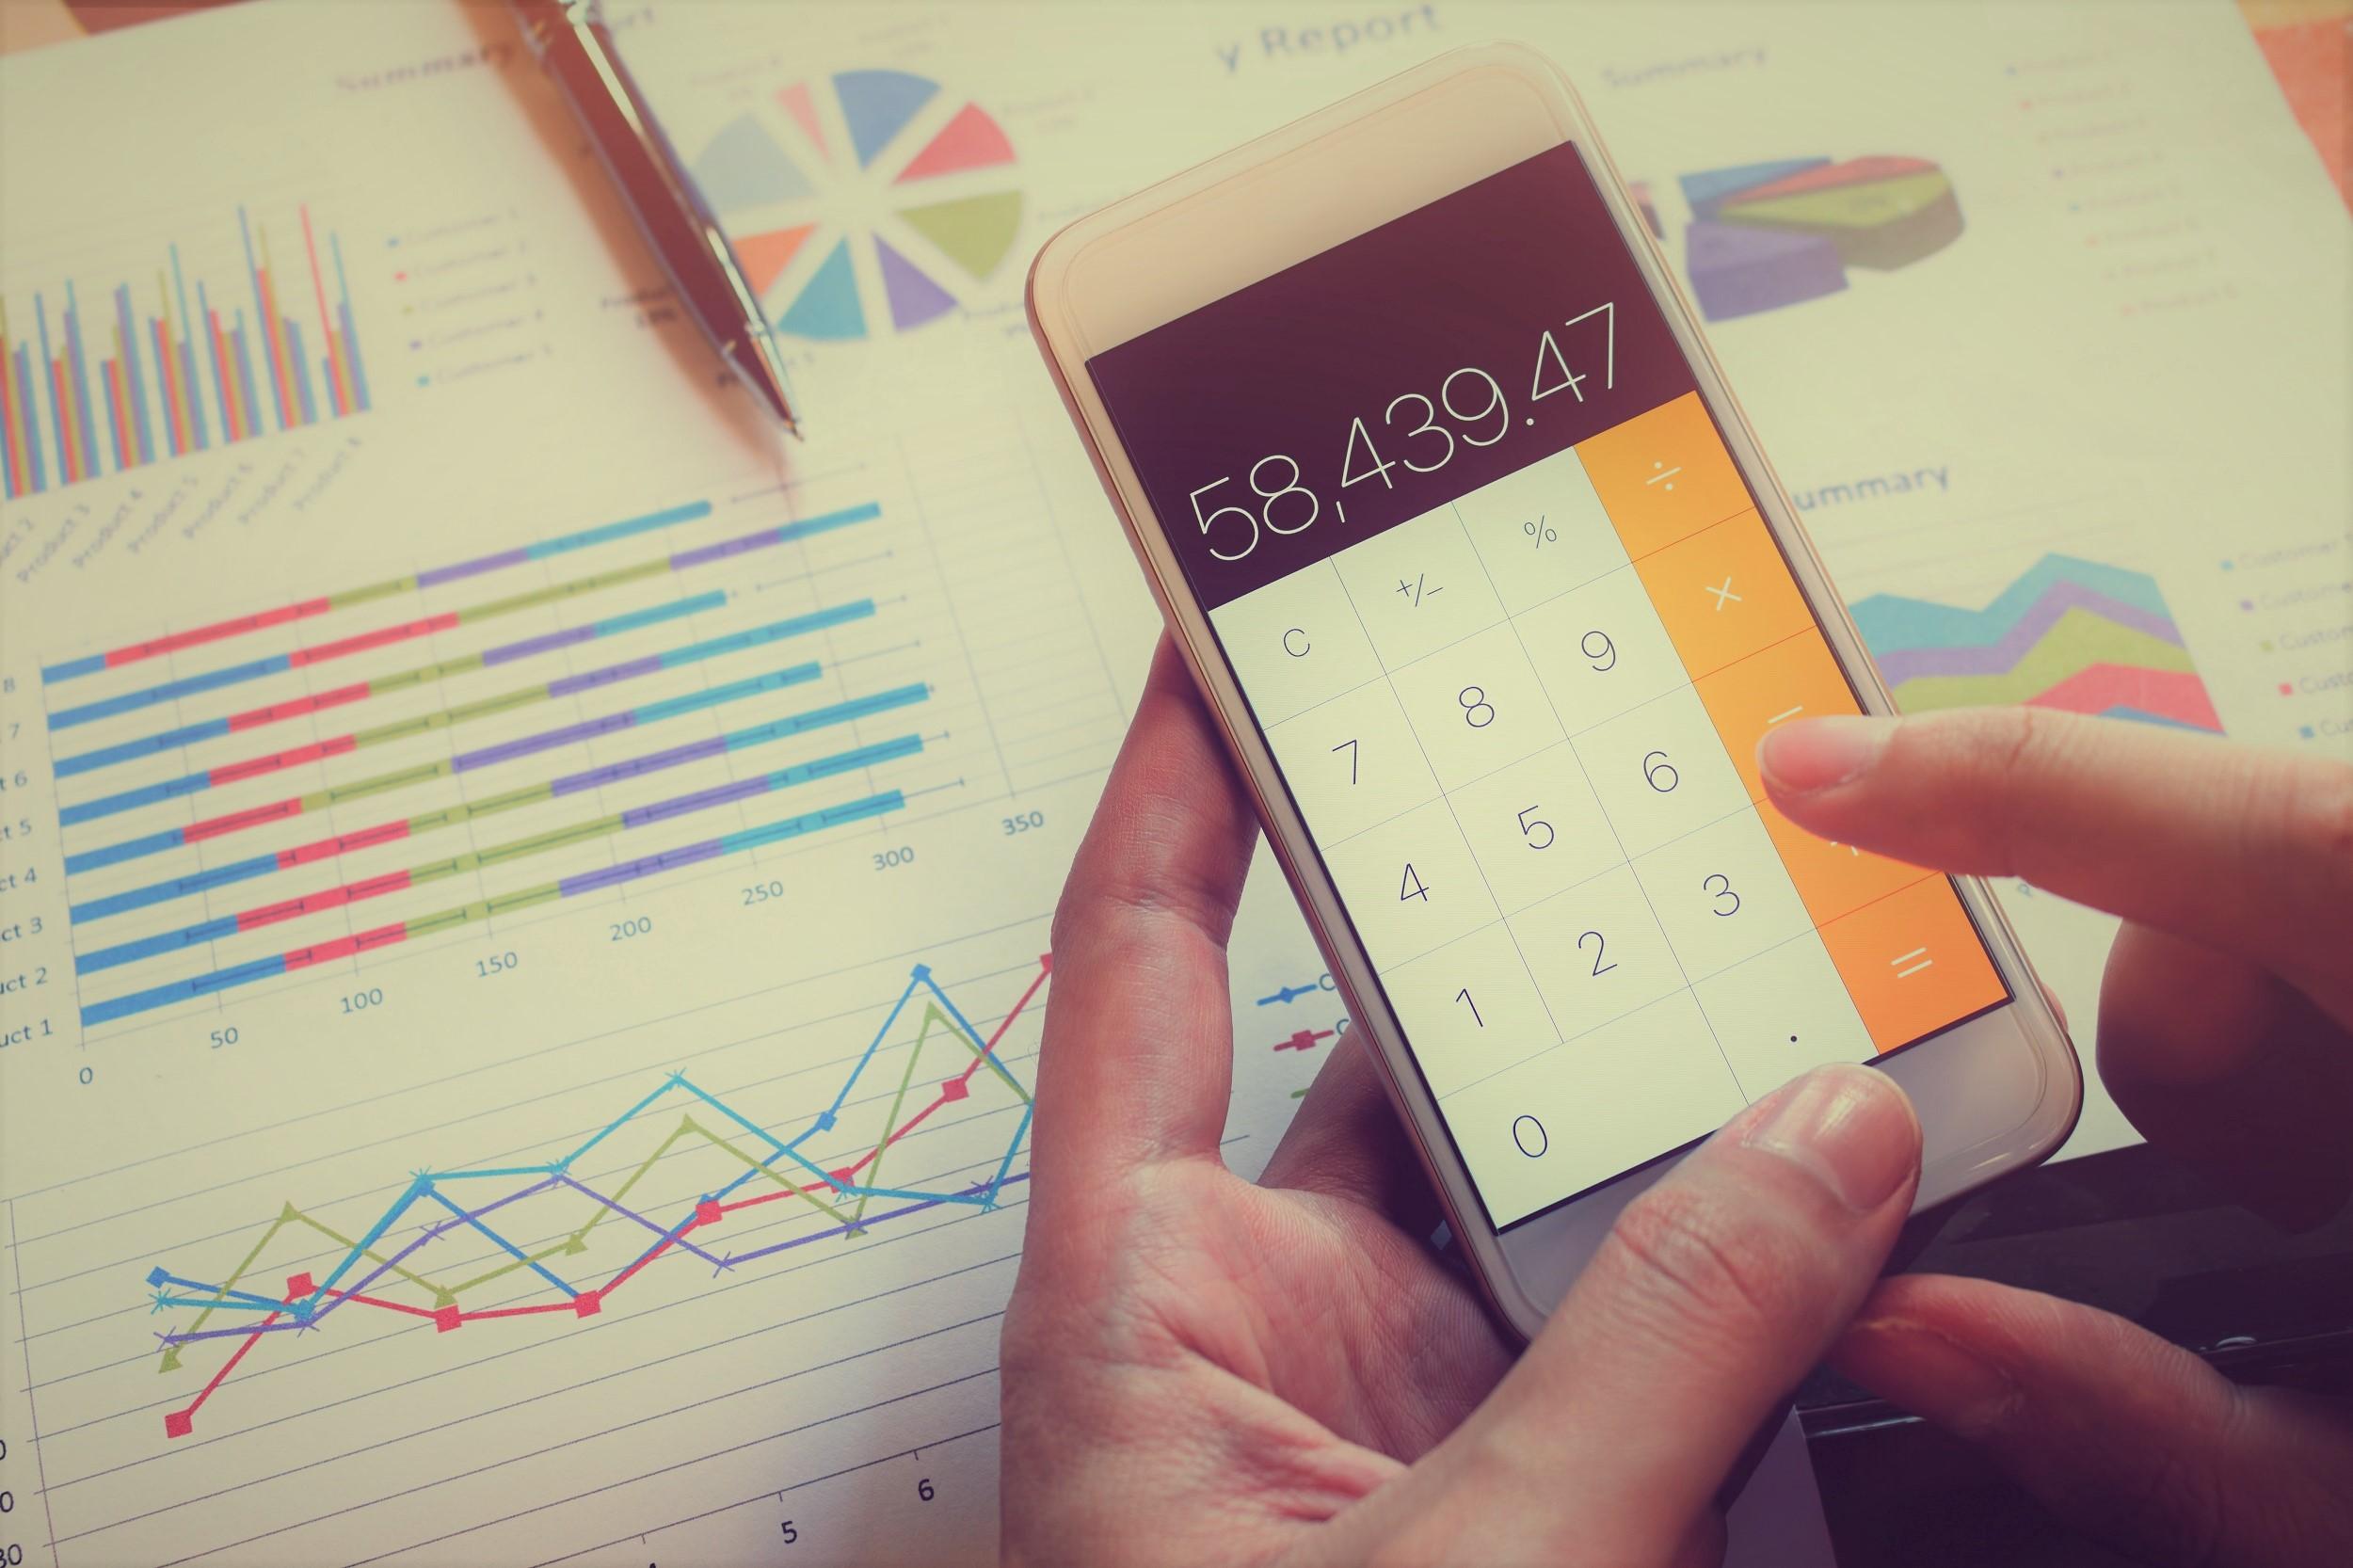 TOP4 sovellusta menojen ja tulojen seurantaan